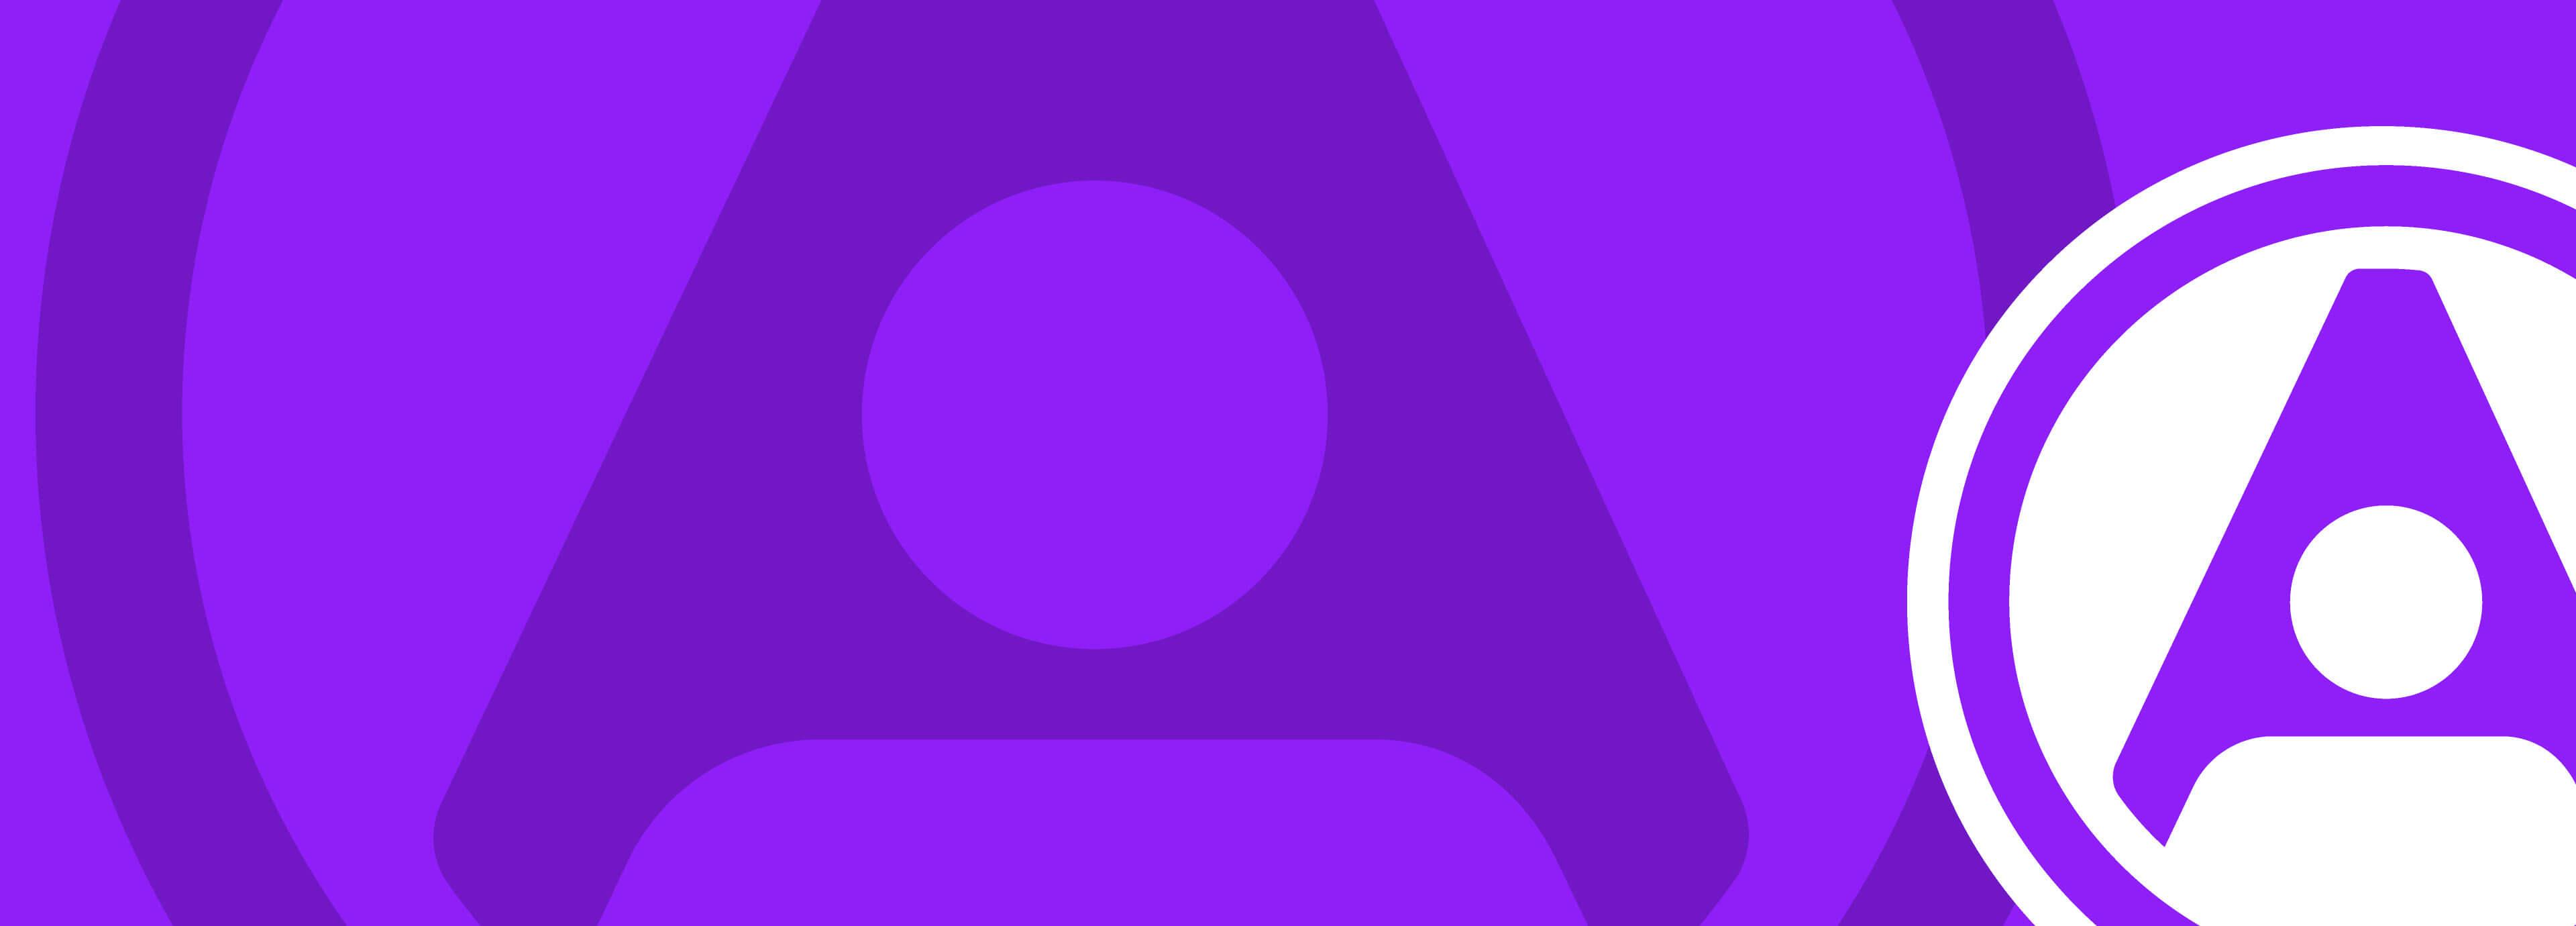 Allocate expands software portfolio with acquisition of Enterprise Study